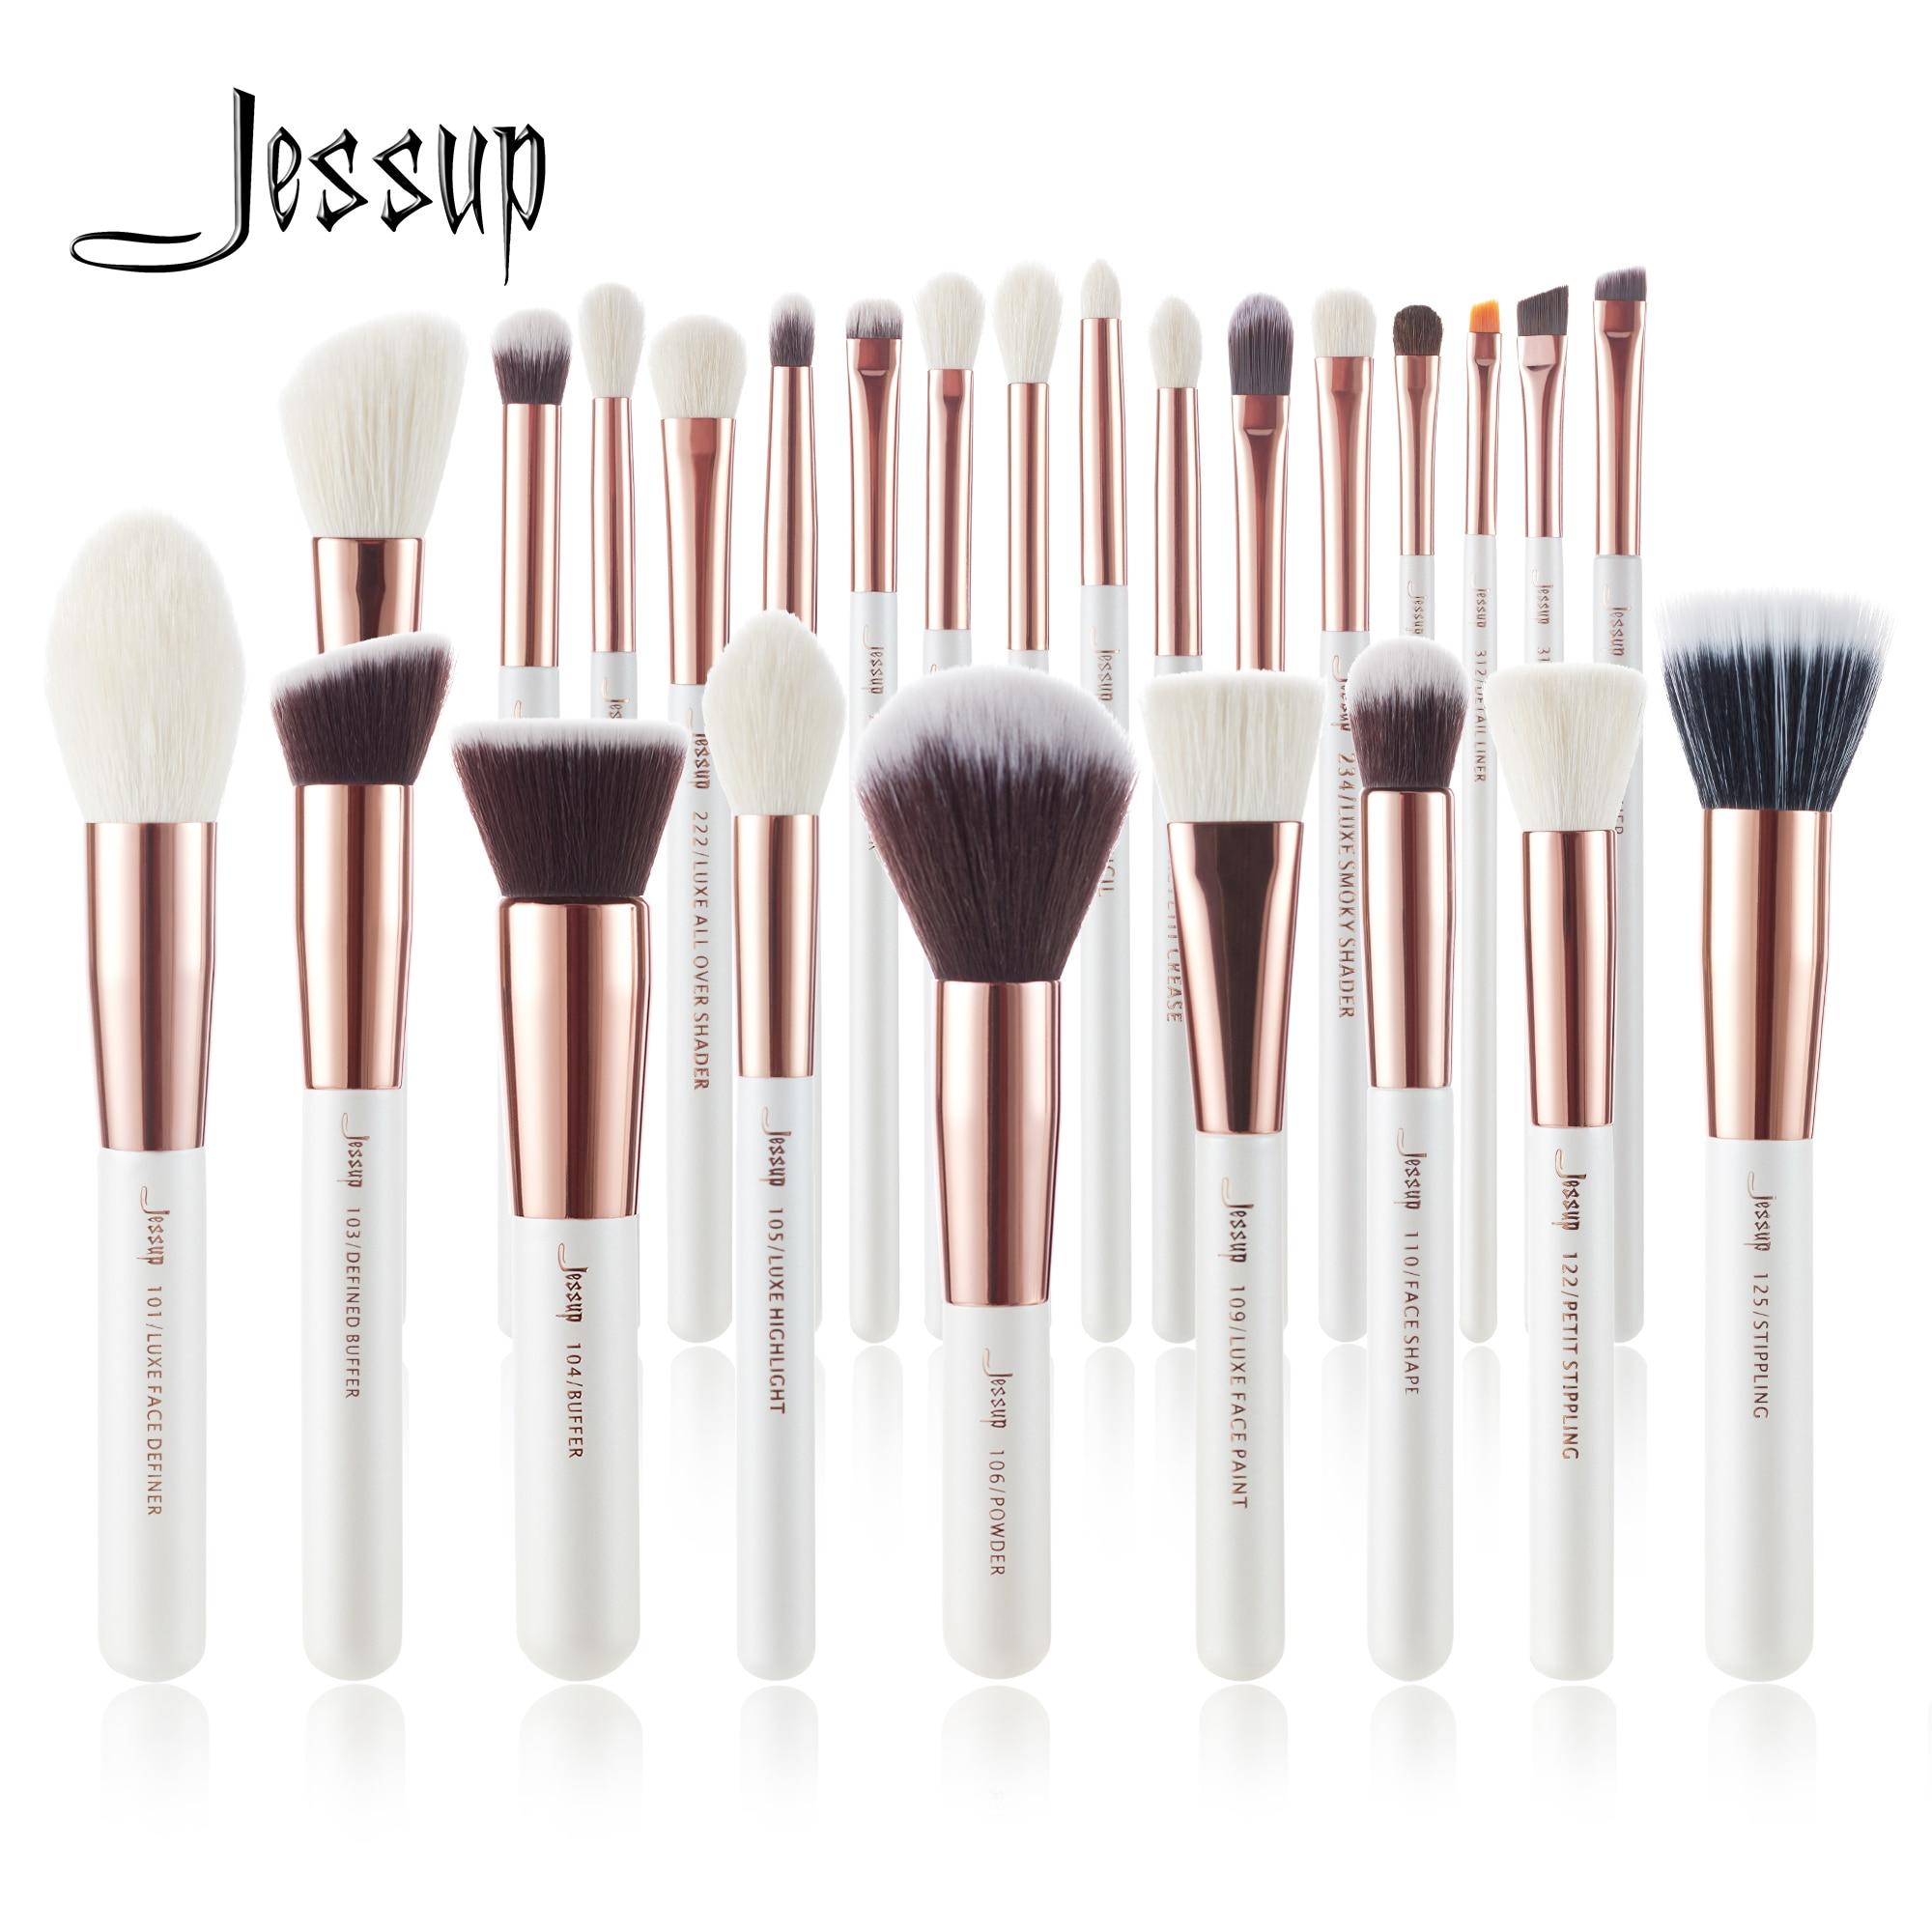 aliexpress.com - Jessup Makeup brushes set 6-25pcs Pearl White / Rose Gold Professional Make up brush Natural hair Foundation Powder Blushes